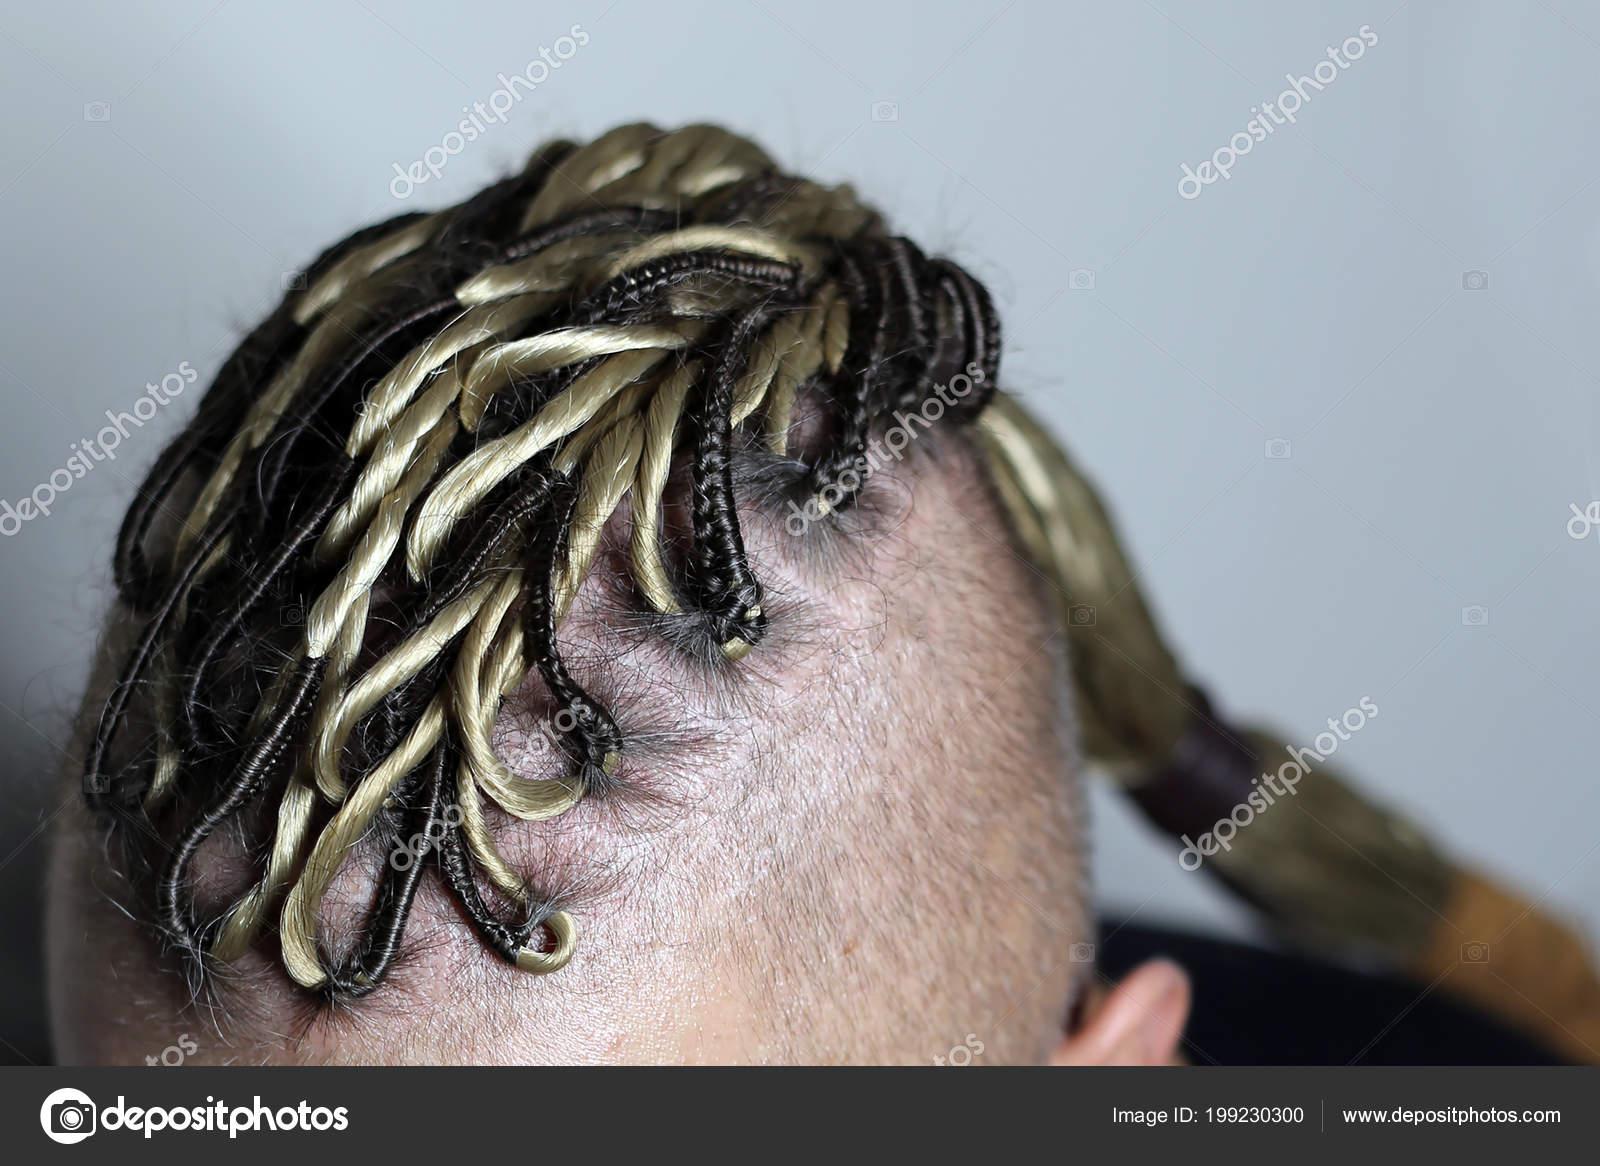 Penteado Masculino Como Dreadlocks Iroquois Viking Cabelo